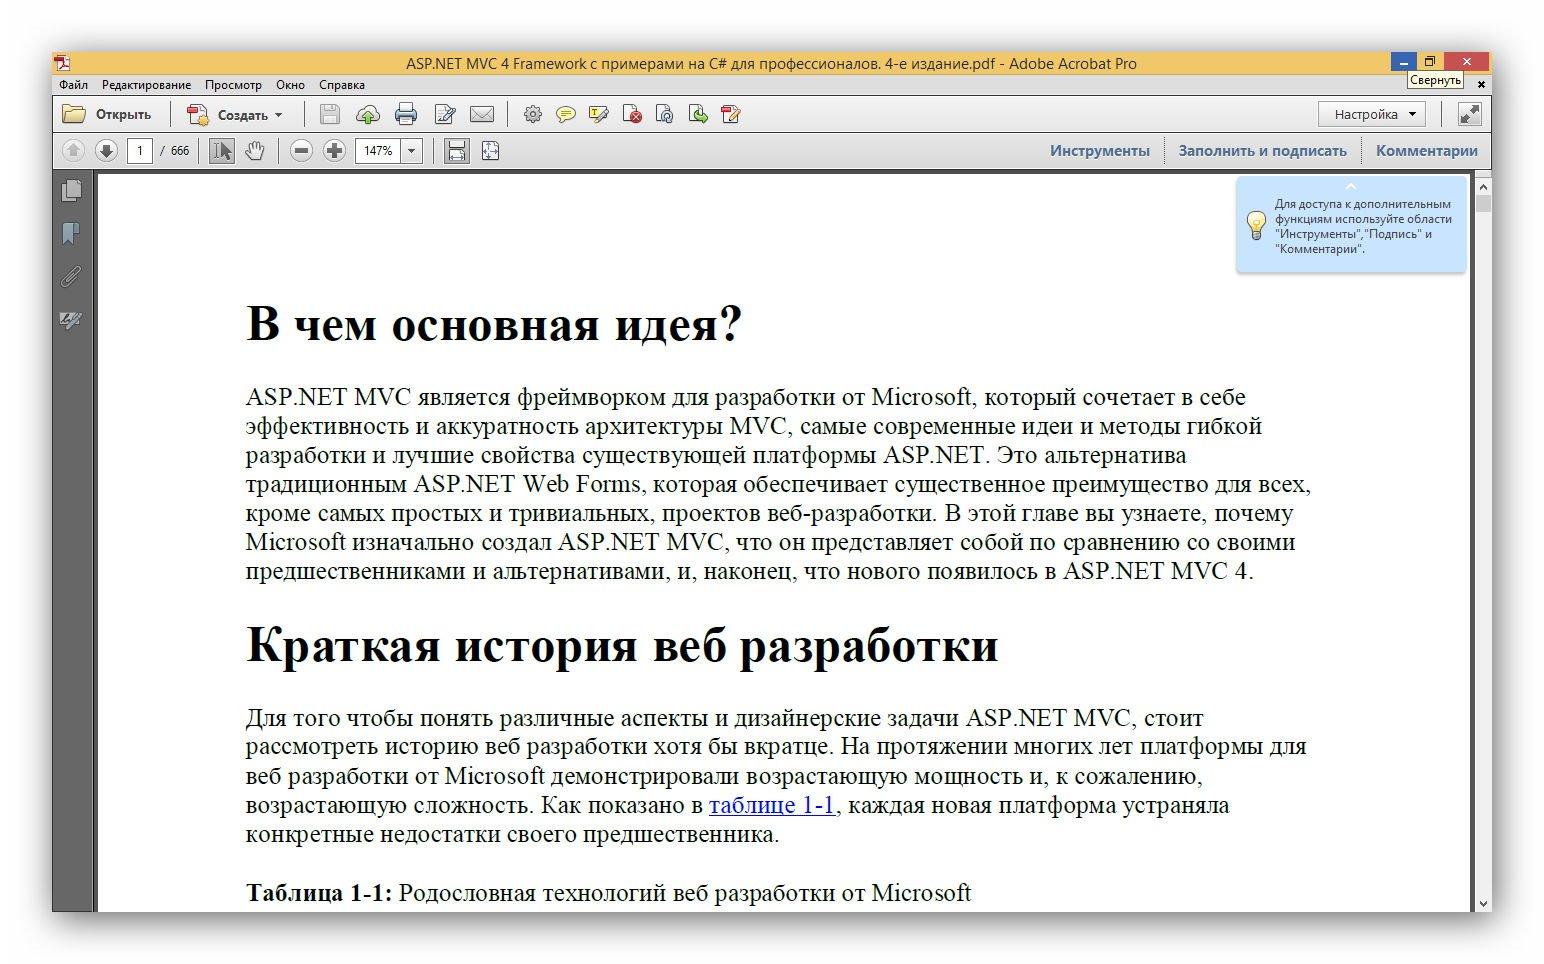 http://fs1.directupload.net/images/150124/gug7yxuk.jpg